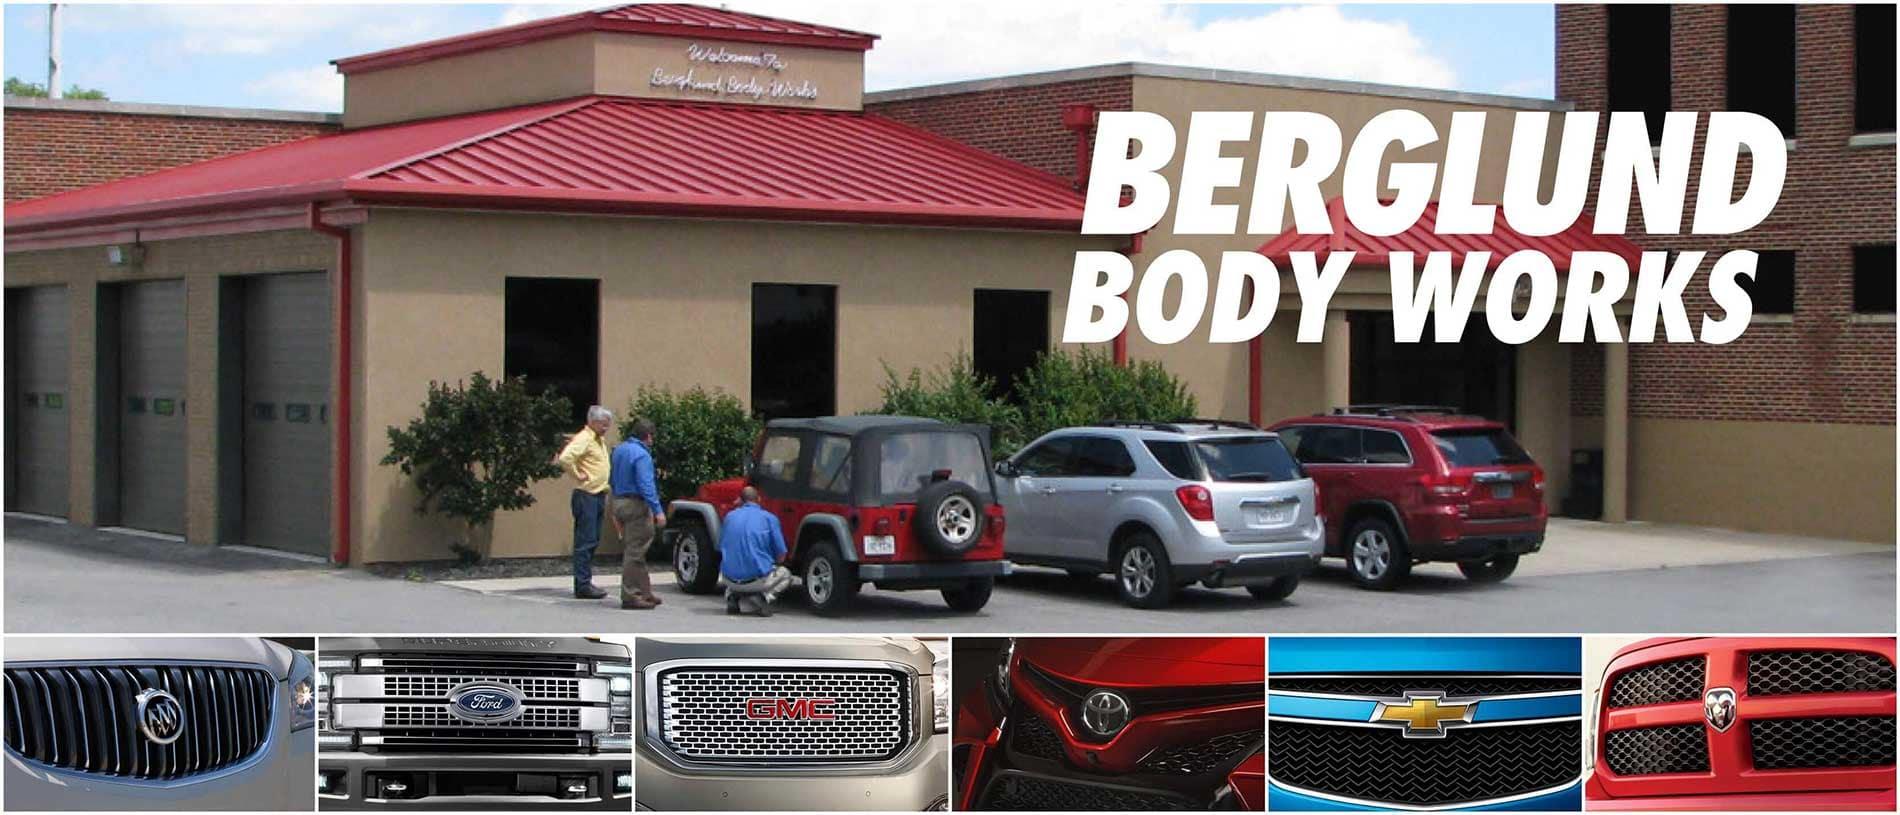 berglund body works